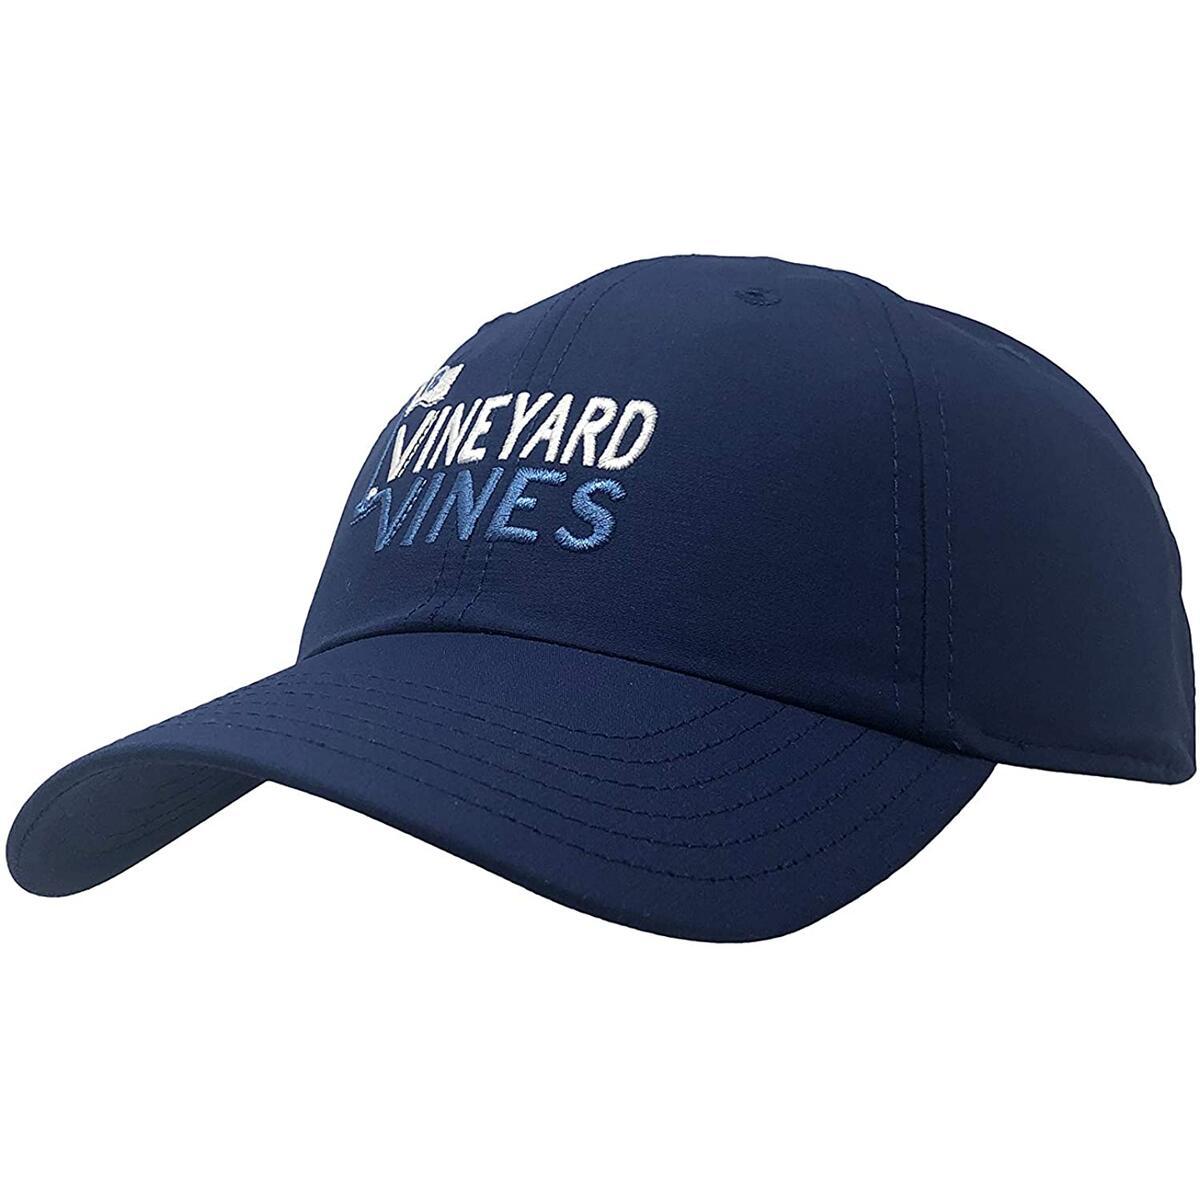 Vineyard Vines High Profile Mesh Back Truckers Hat OSFA Adjustable Cap (One Size, Navy Performance Hat)